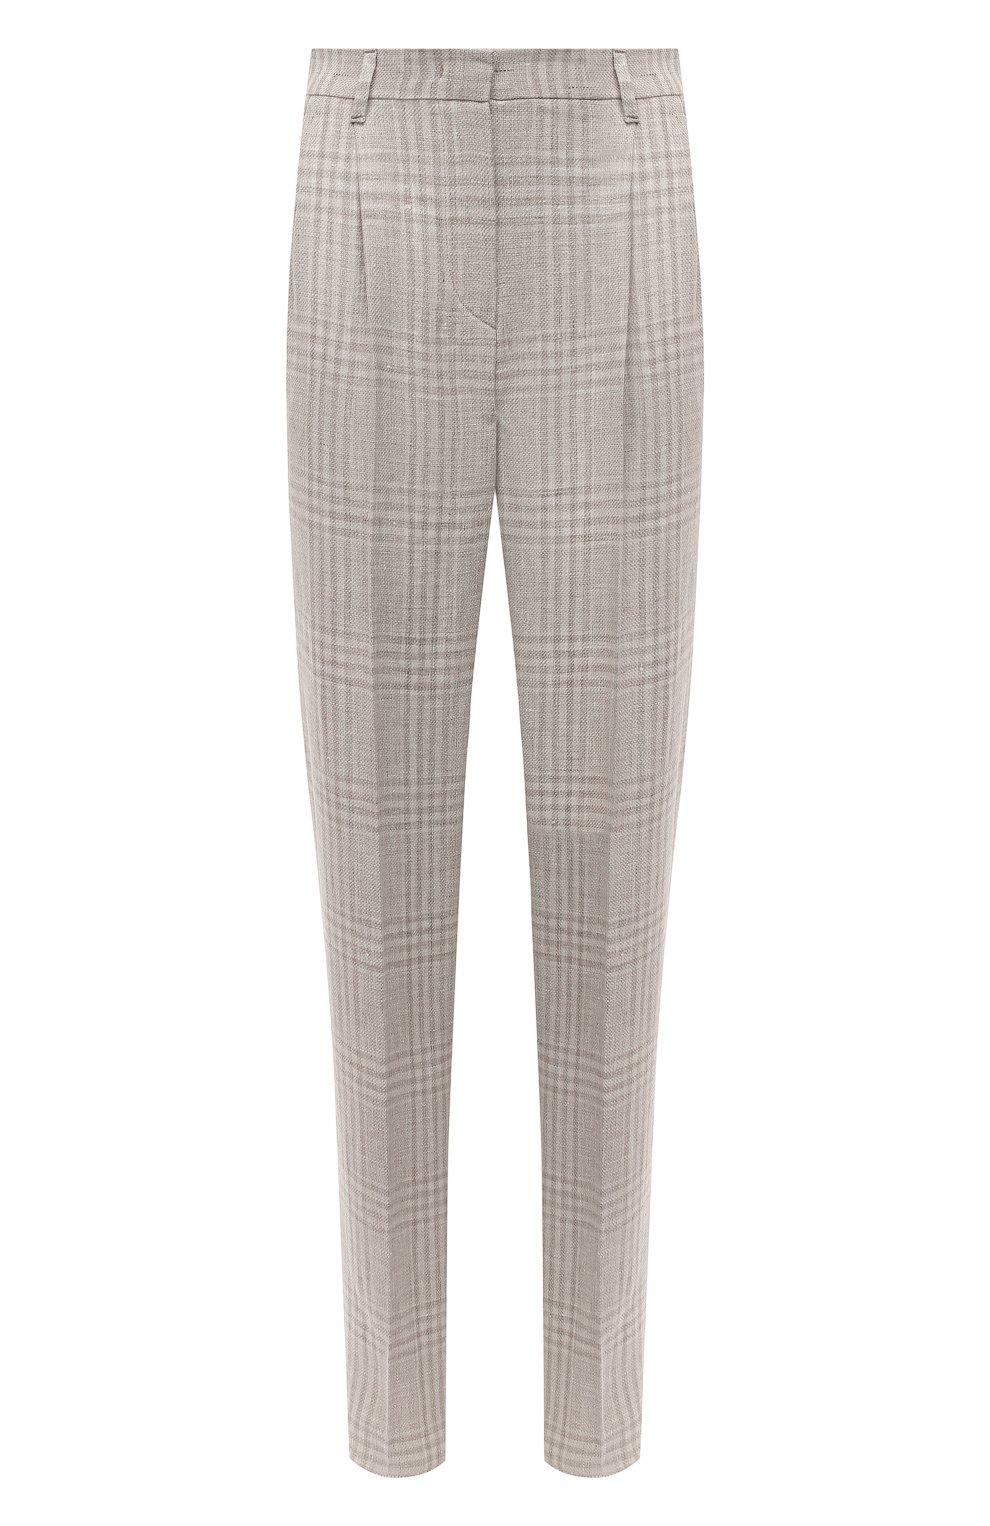 Женские брюки из льна и шерсти EMPORIO ARMANI бежевого цвета, арт. 0NP4CT/02167 | Фото 1